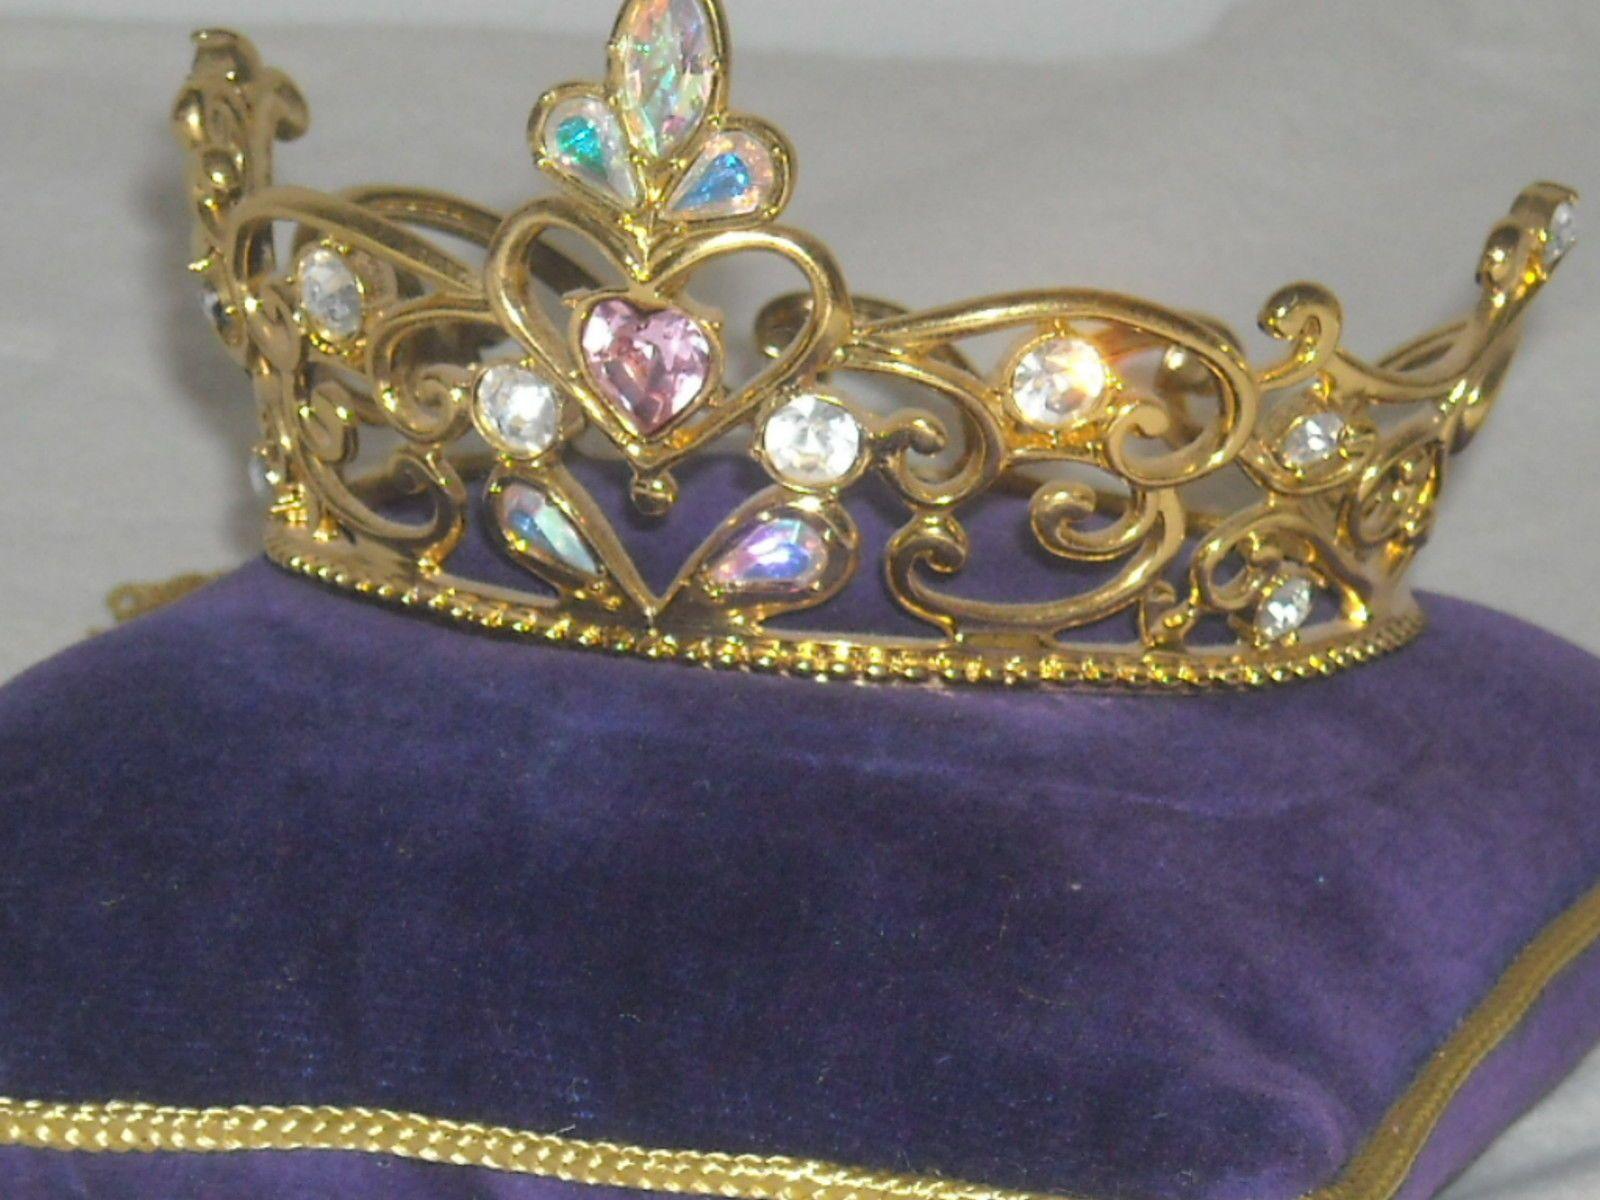 Franklin Mint Cinderella Tiara Crown with Pillow   eBay